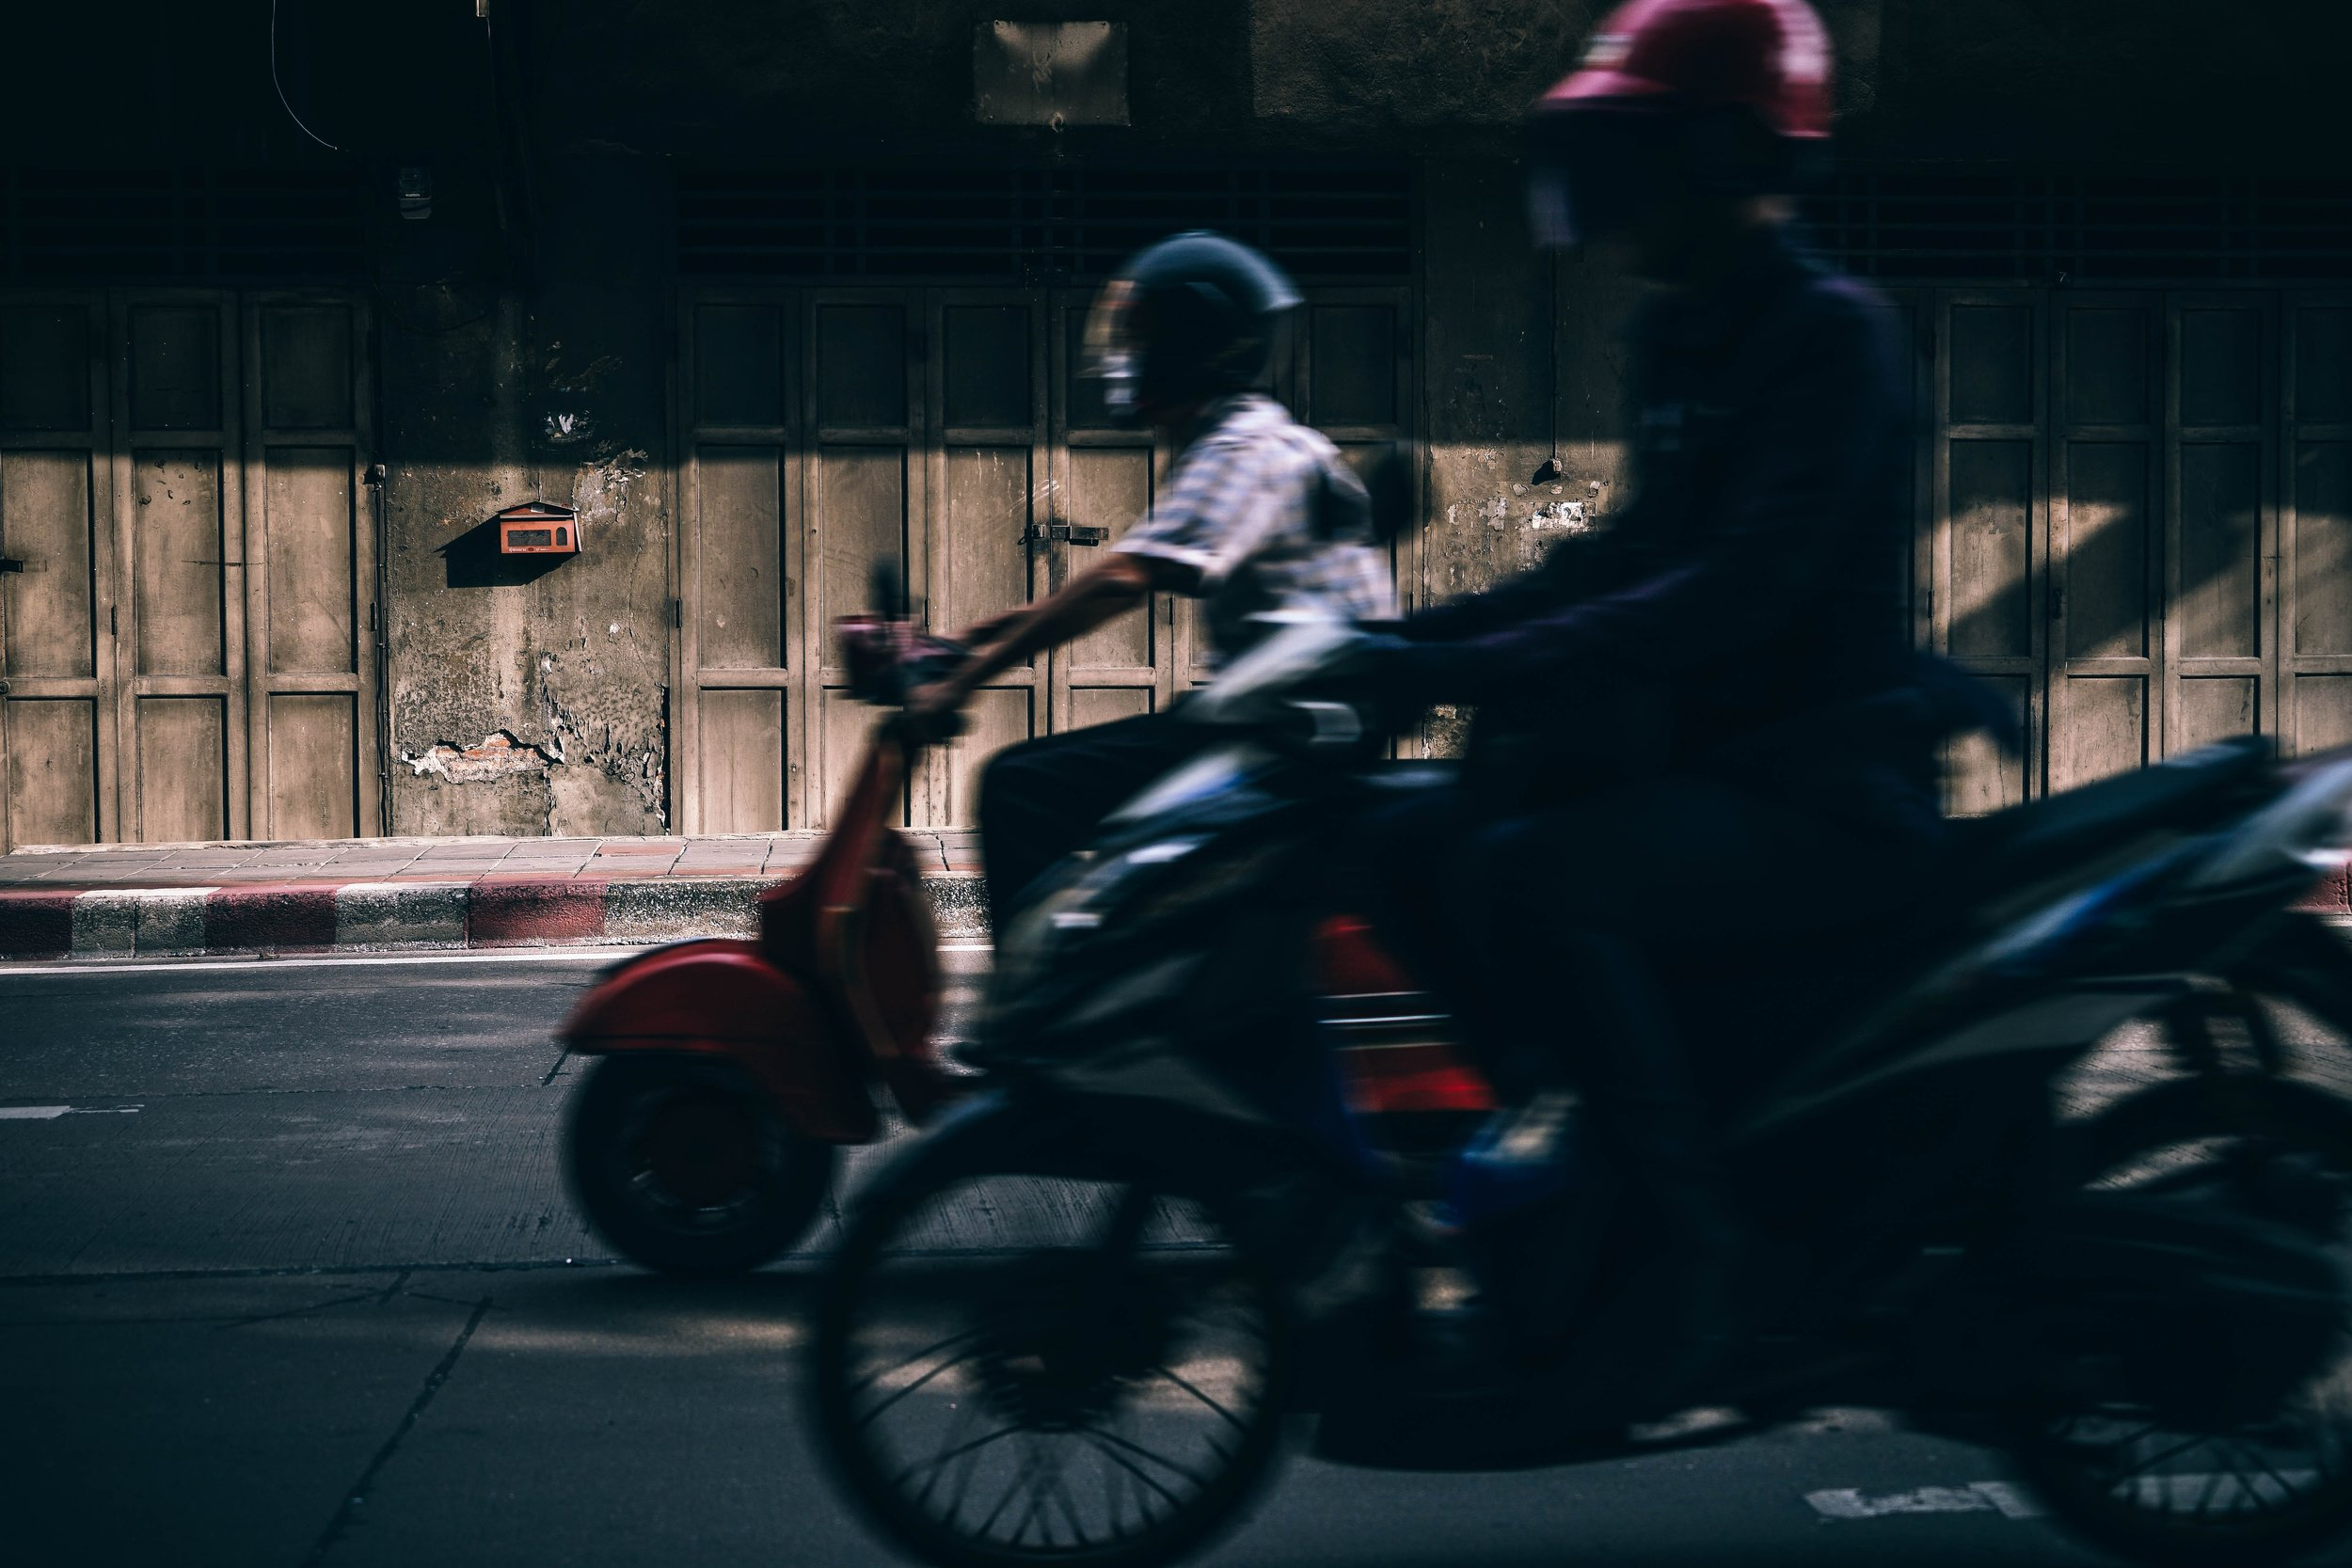 igor-ovsyannykov-178759 moped motorcycle enabled crime photo.jpg